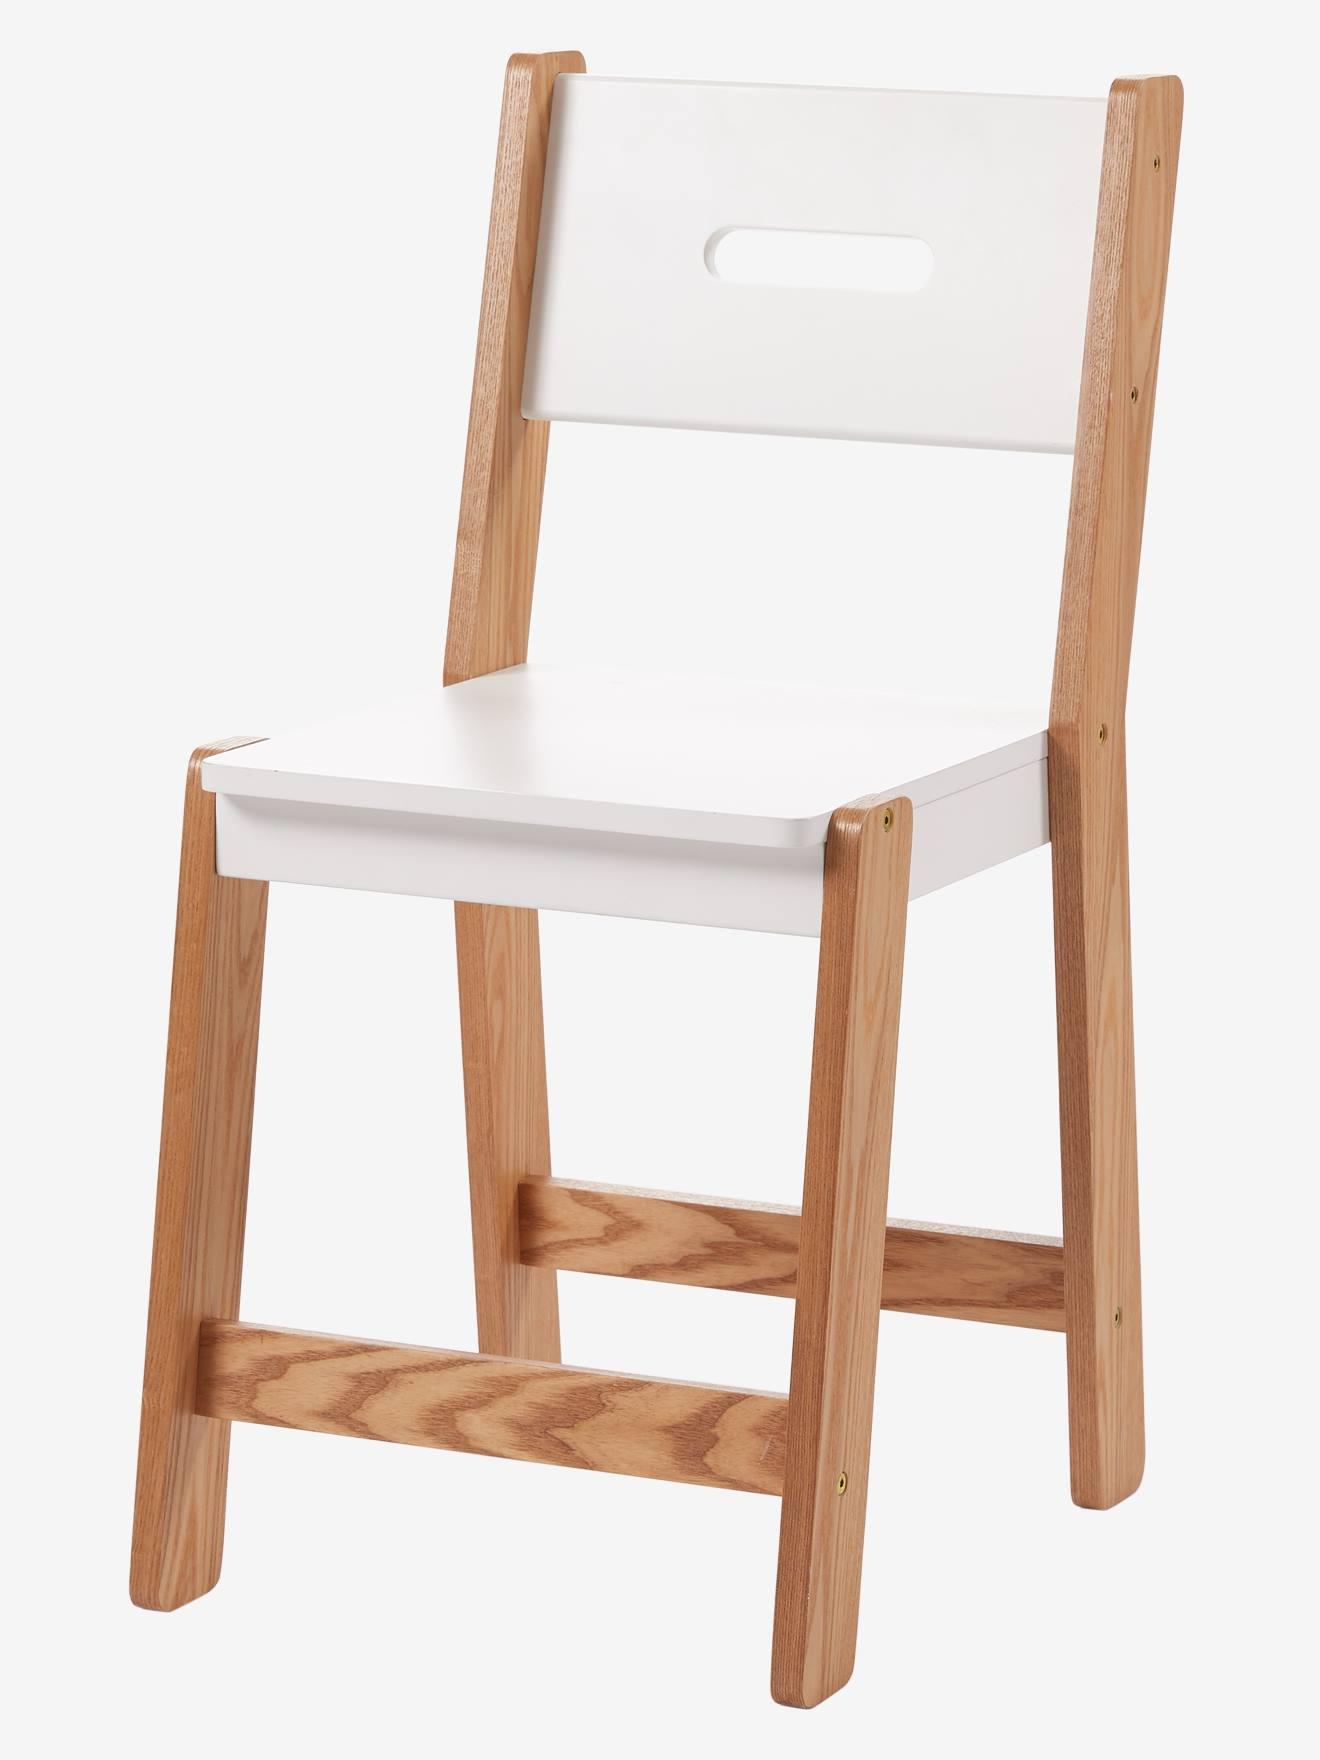 Cadeira especial primária, altura 45 cm, linha Architekt branco claro bicolor/multicolo